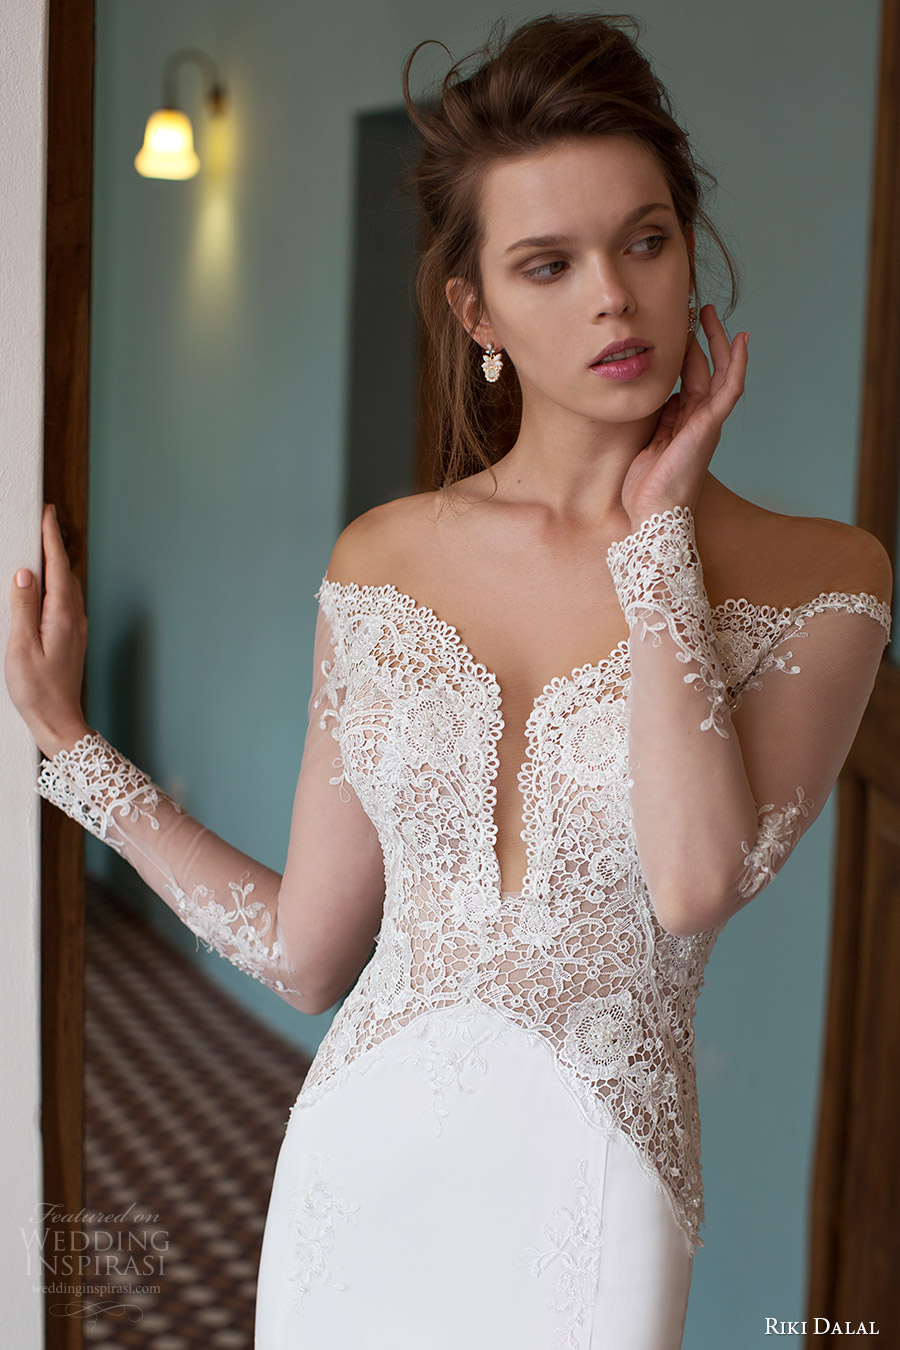 riki dalal bridal 2016 illusion long sleeves off shoulder pluging sweetheart lace sheath wedding dress (1810) zv elegant pretty romantic